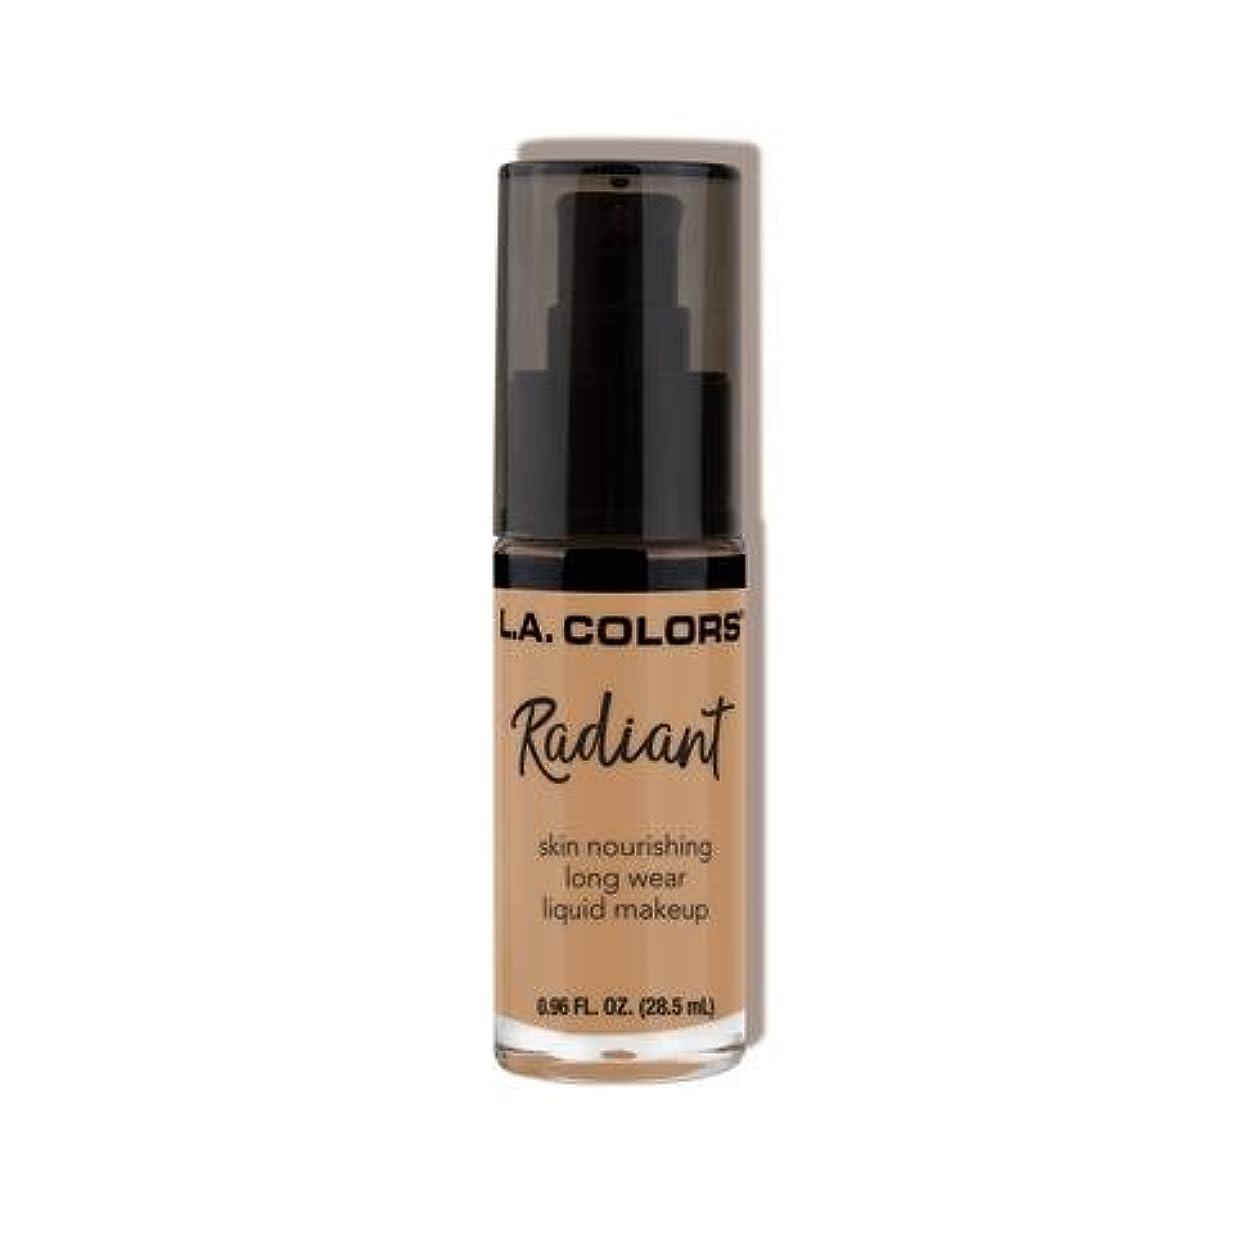 一致家畜項目(3 Pack) L.A. COLORS Radiant Liquid Makeup - Light Toffee (並行輸入品)